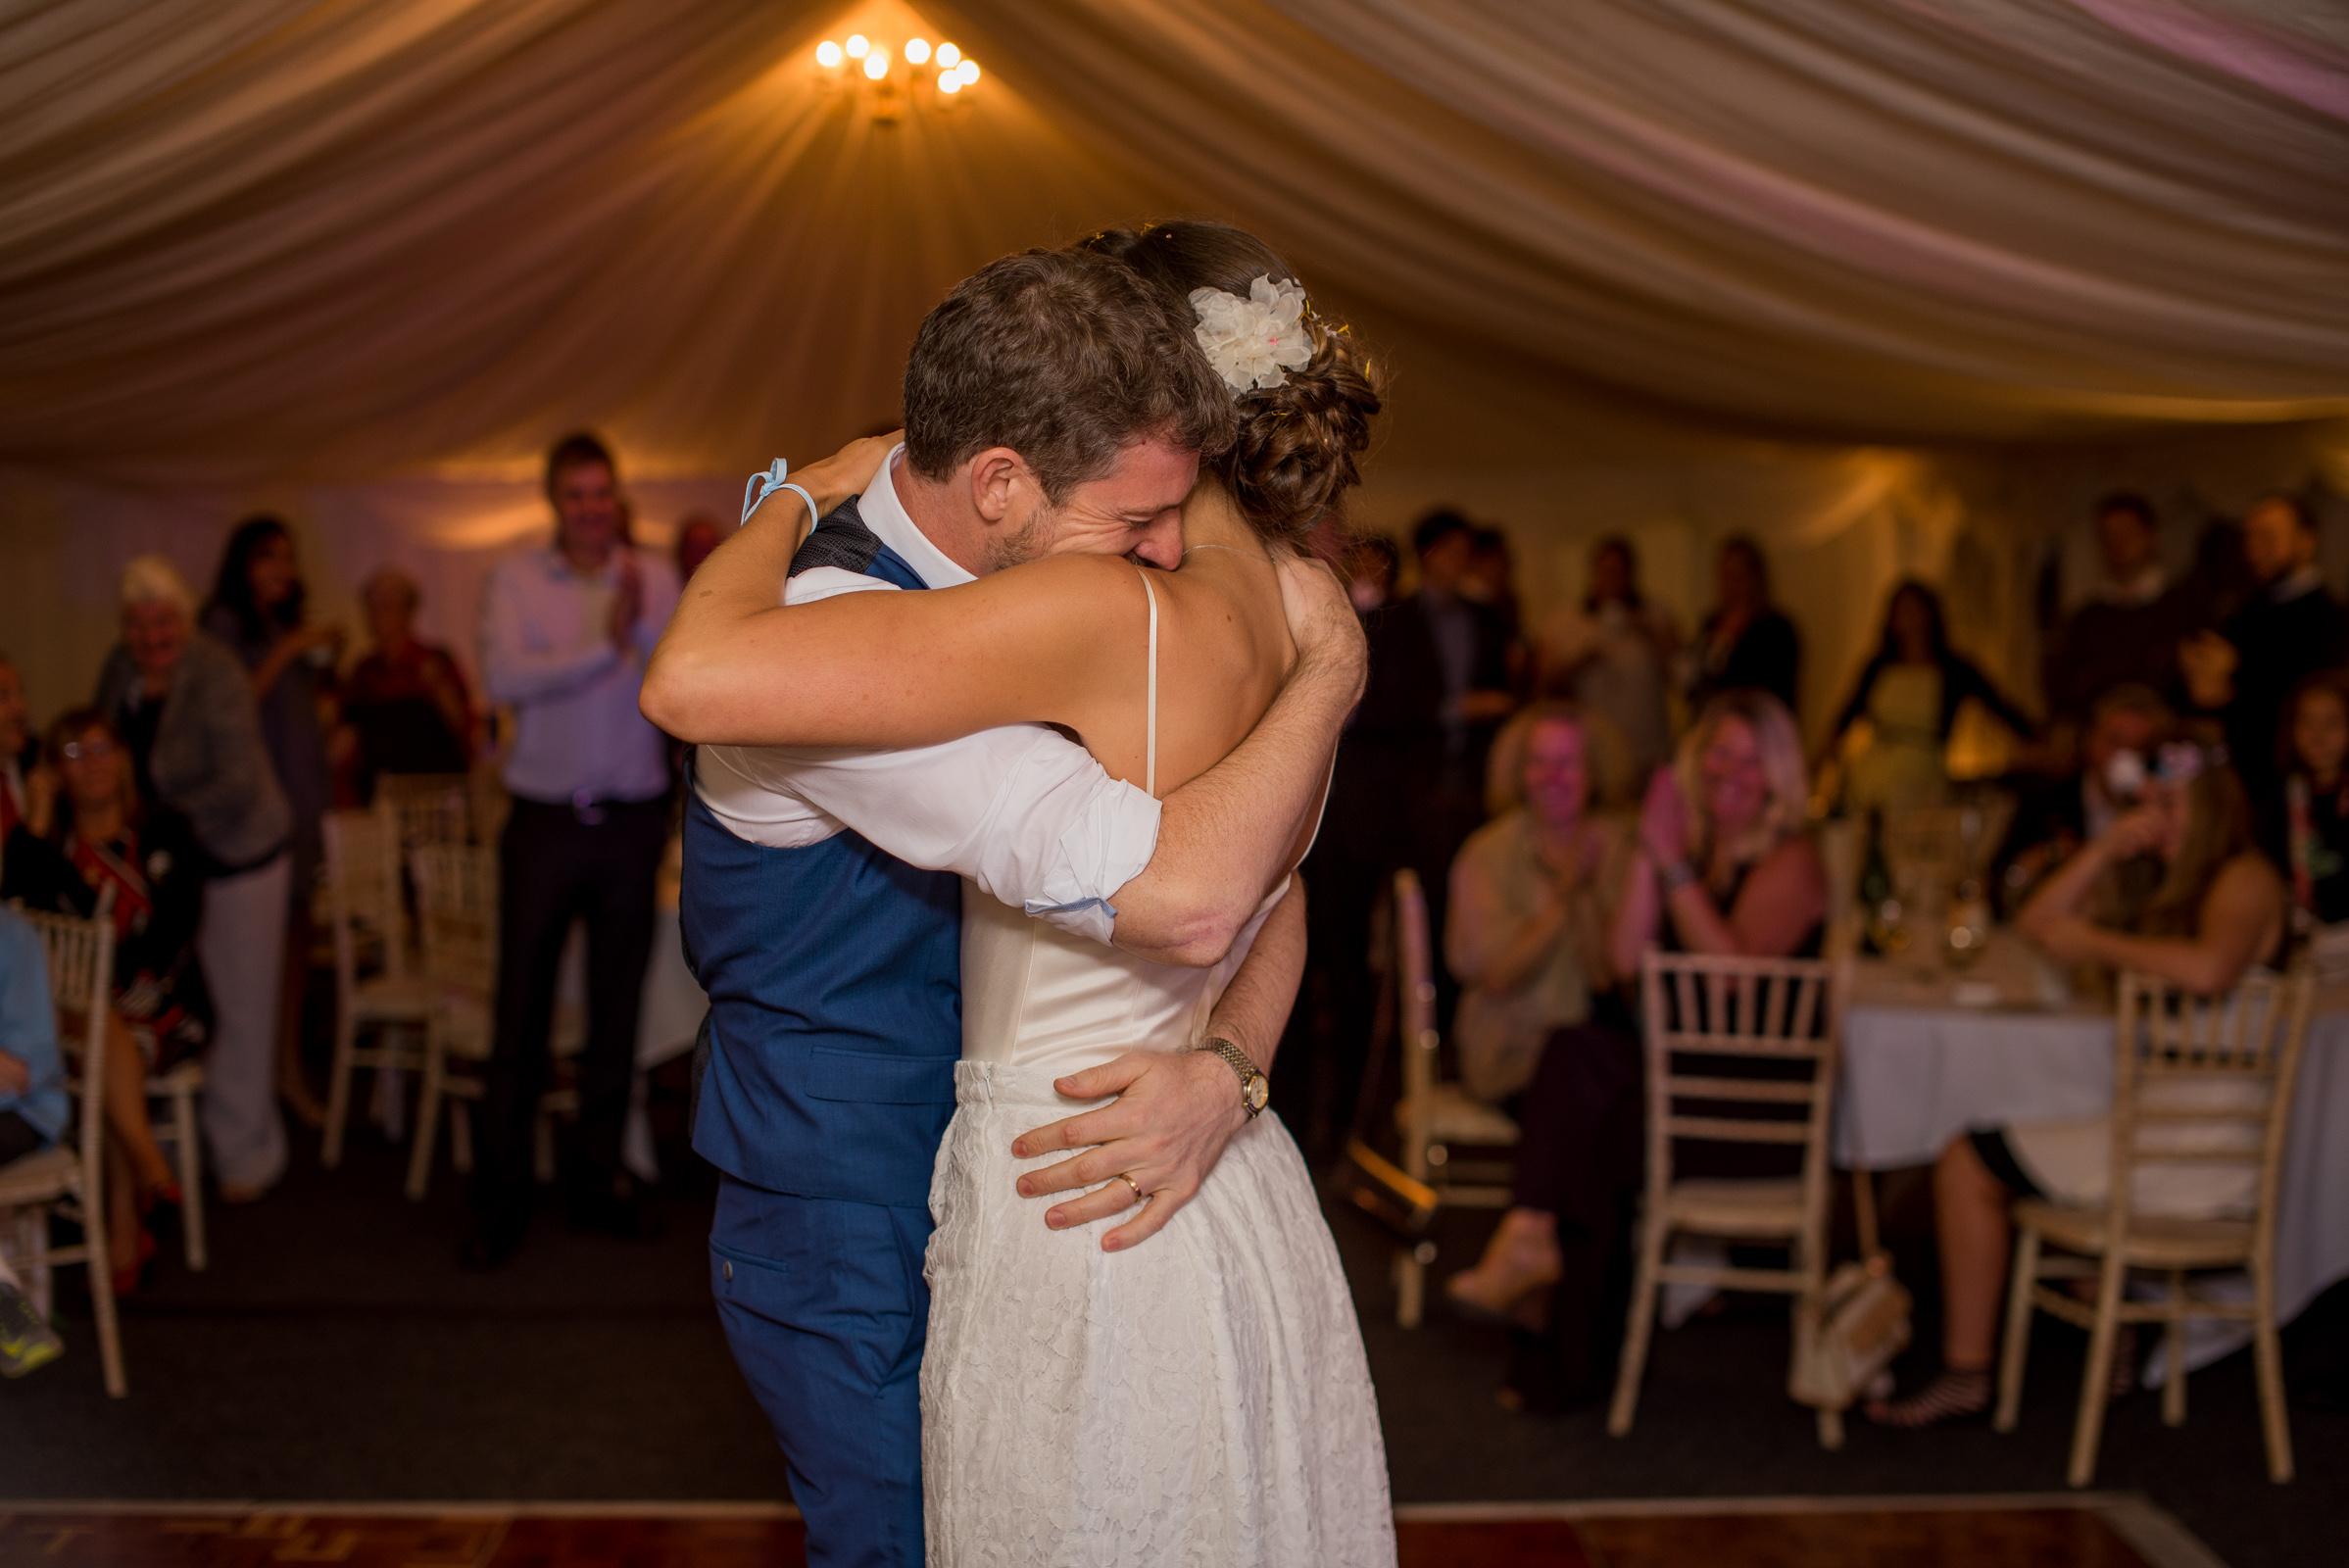 Professional Wedding Photographer - James A Photography